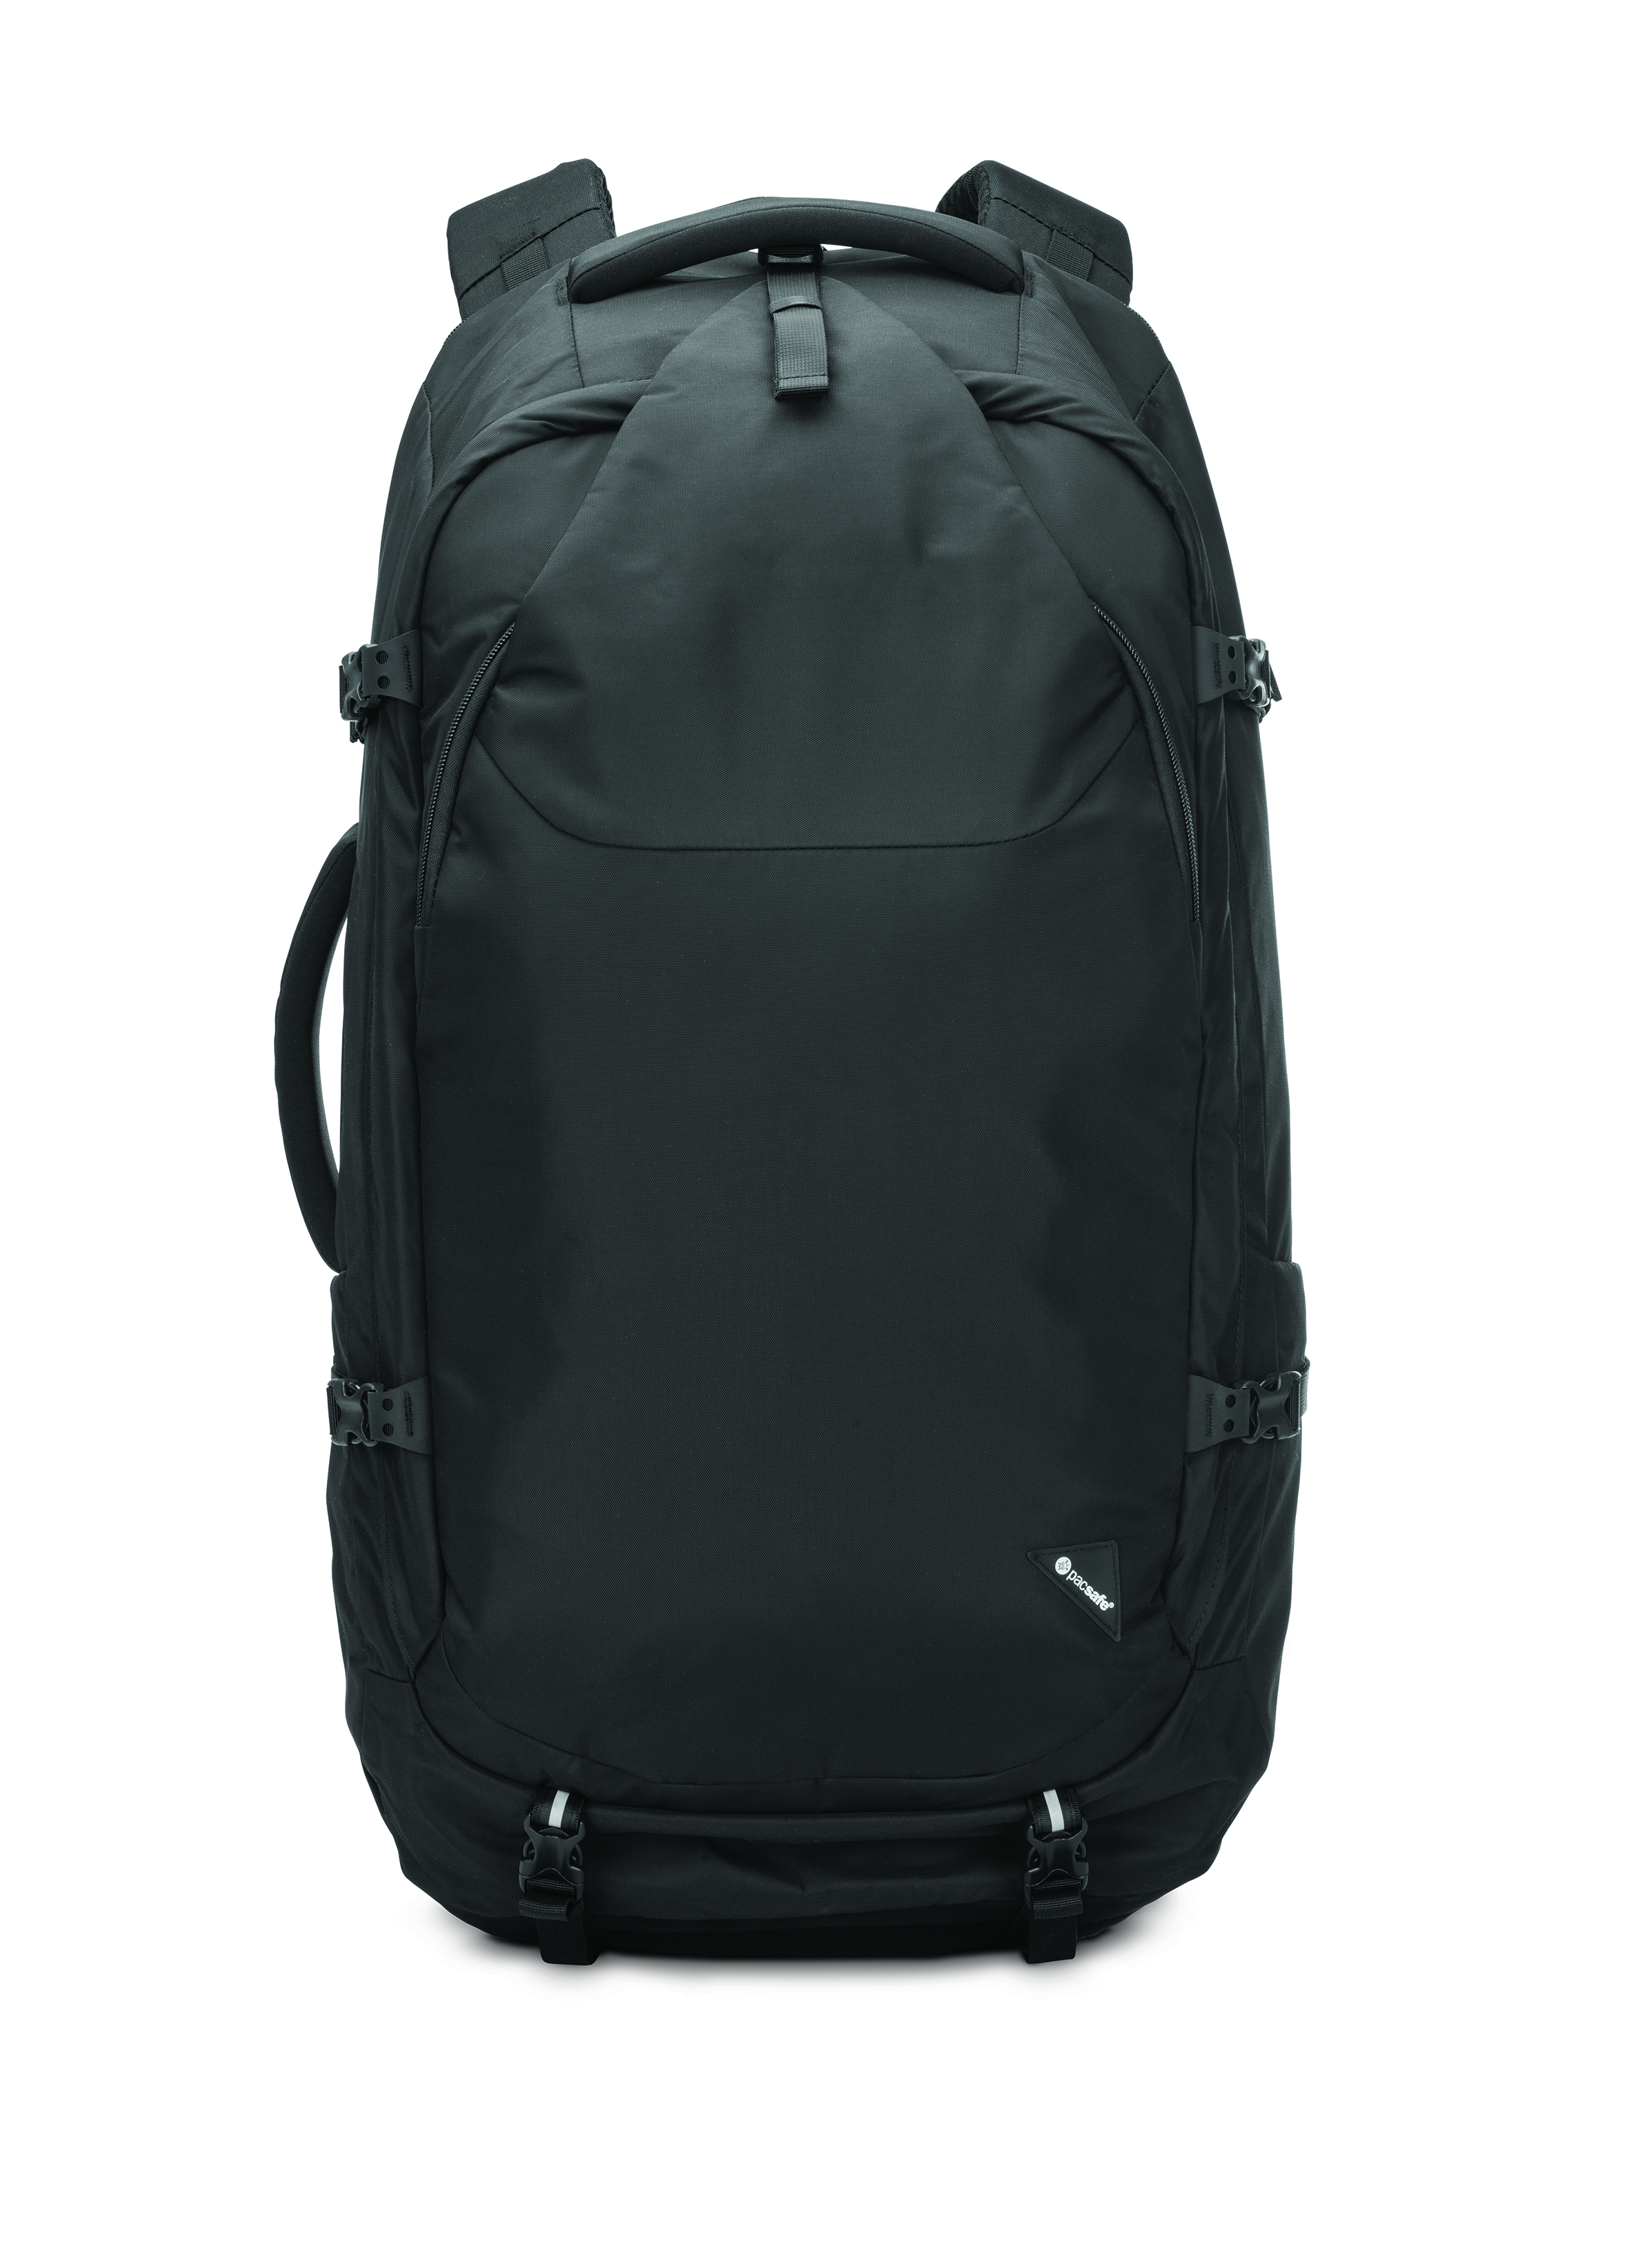 08c9a92cb349 Pacsafe Venturesafe EXP65 Anti-theft Travel Pack